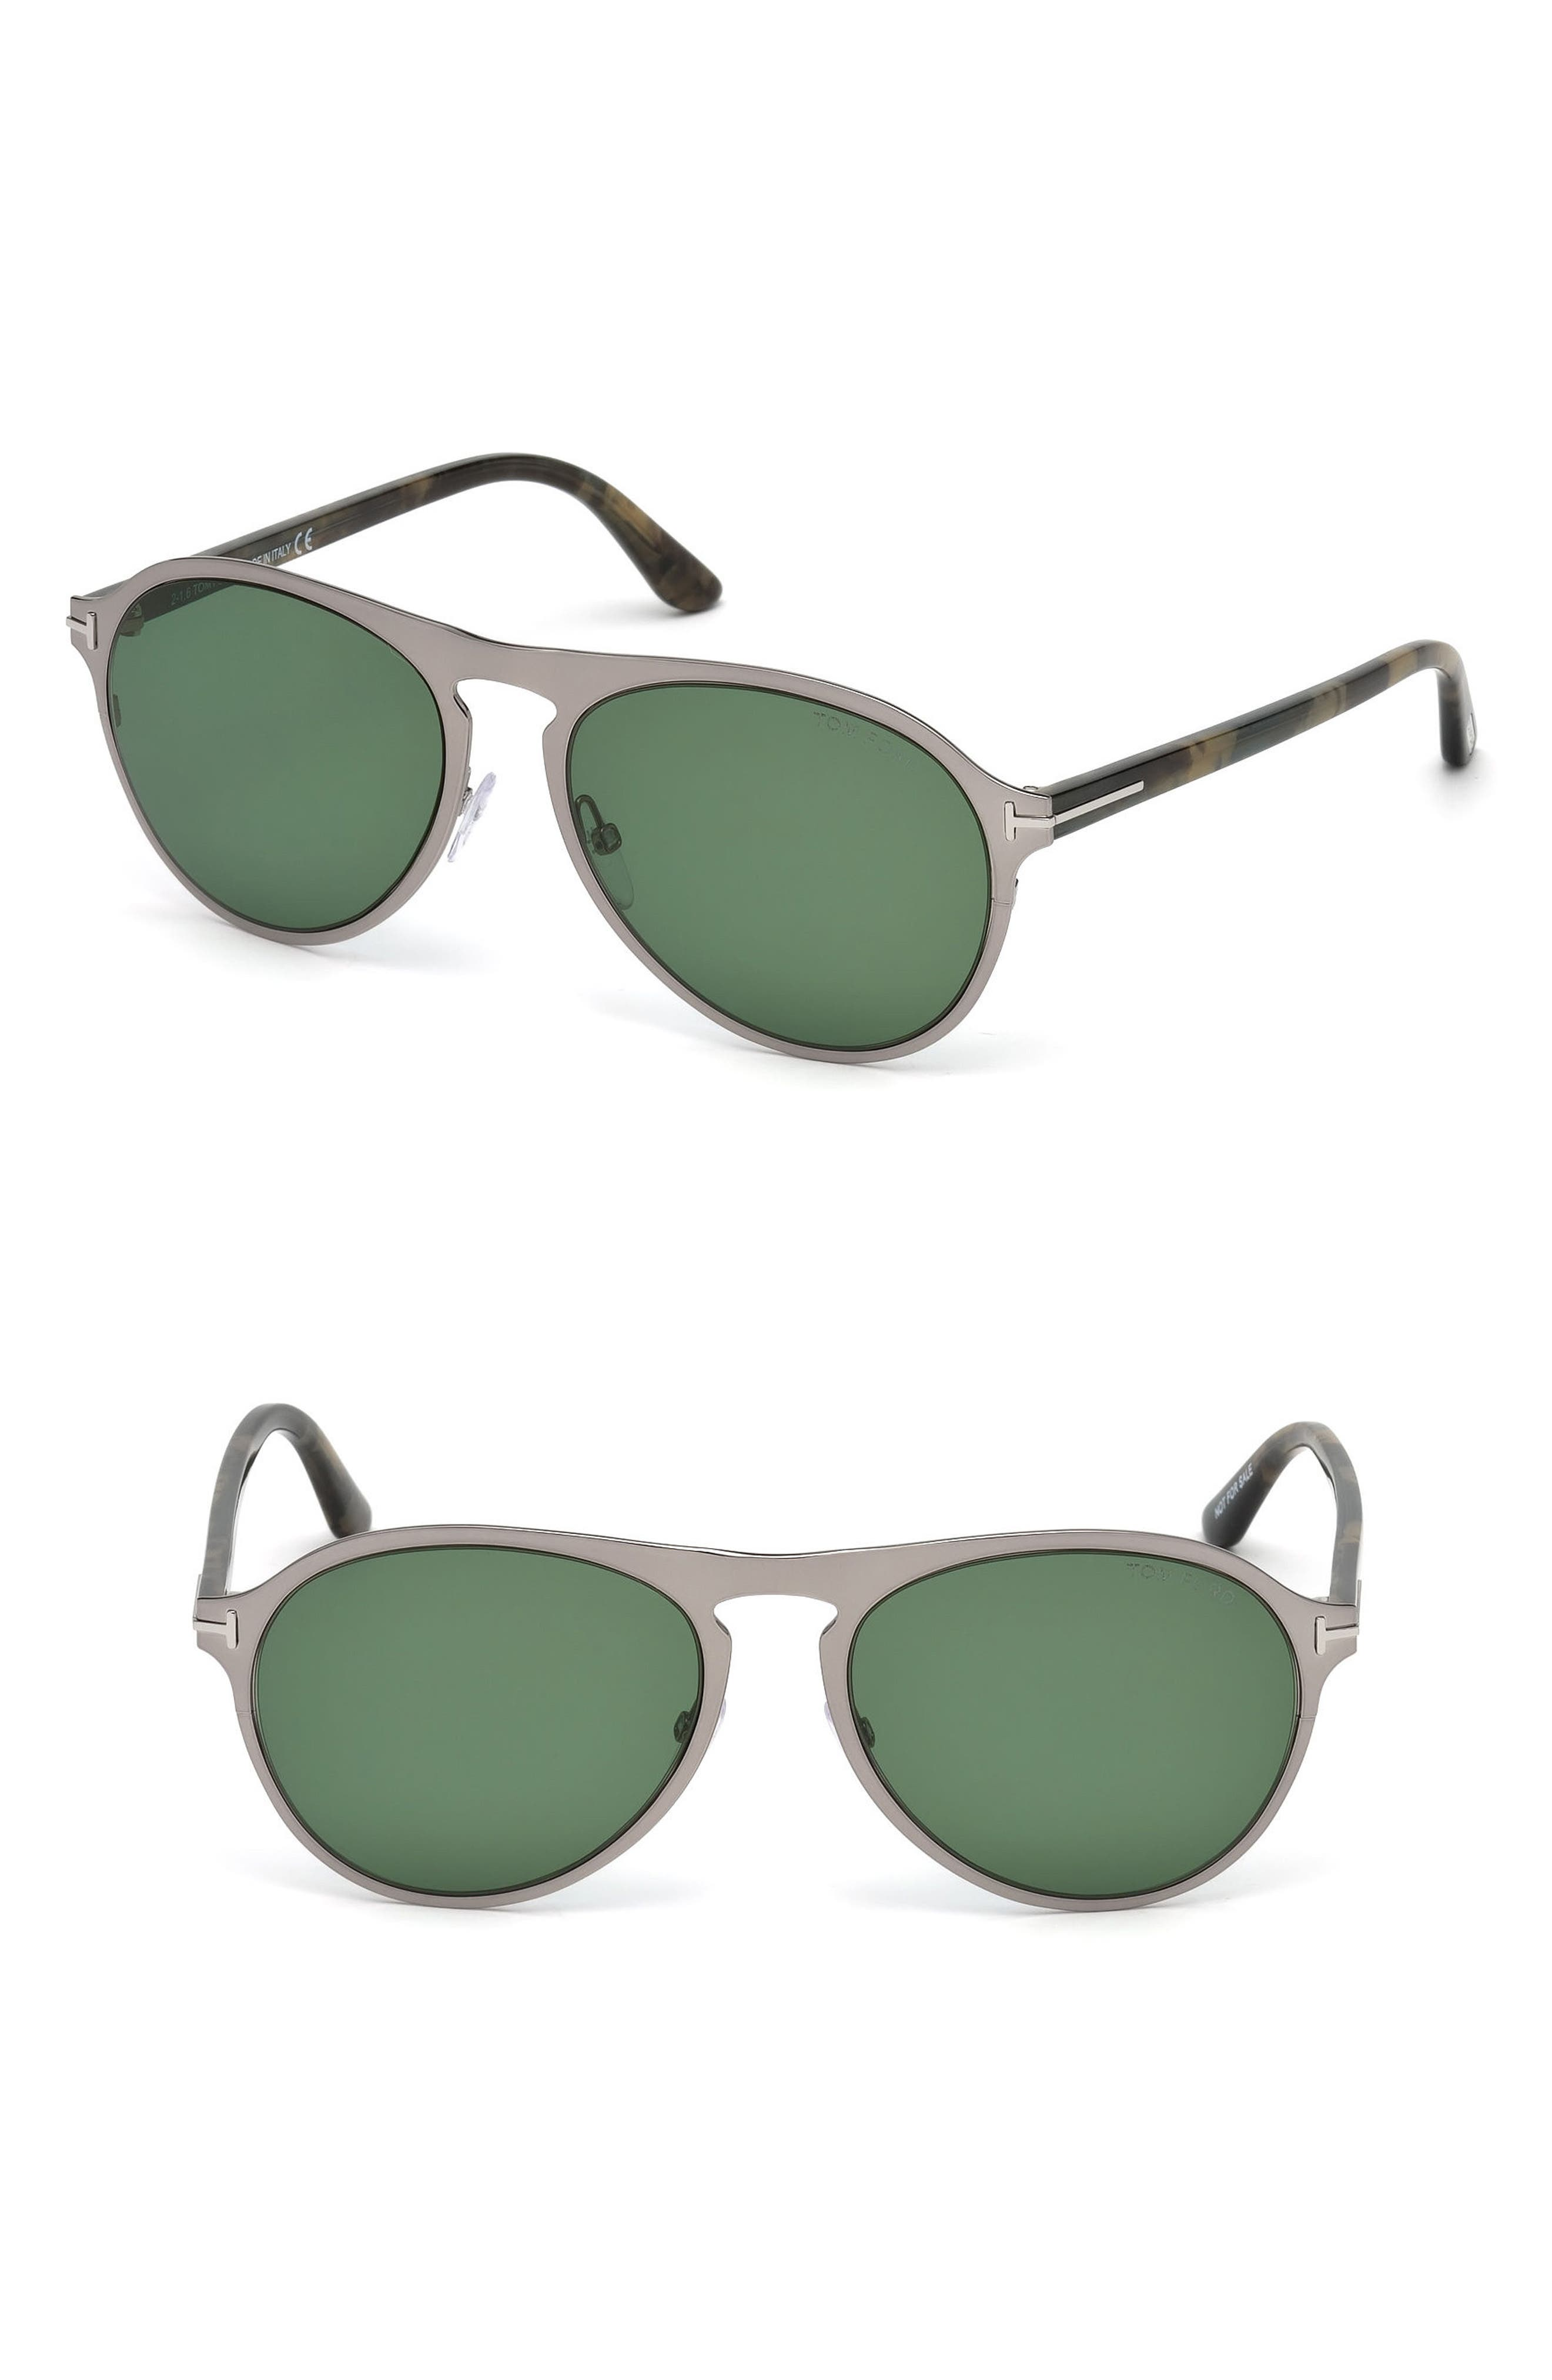 Bradburry 56mm Sunglasses, Main, color, SHINY LIGHT RUTHENIUM / GREEN